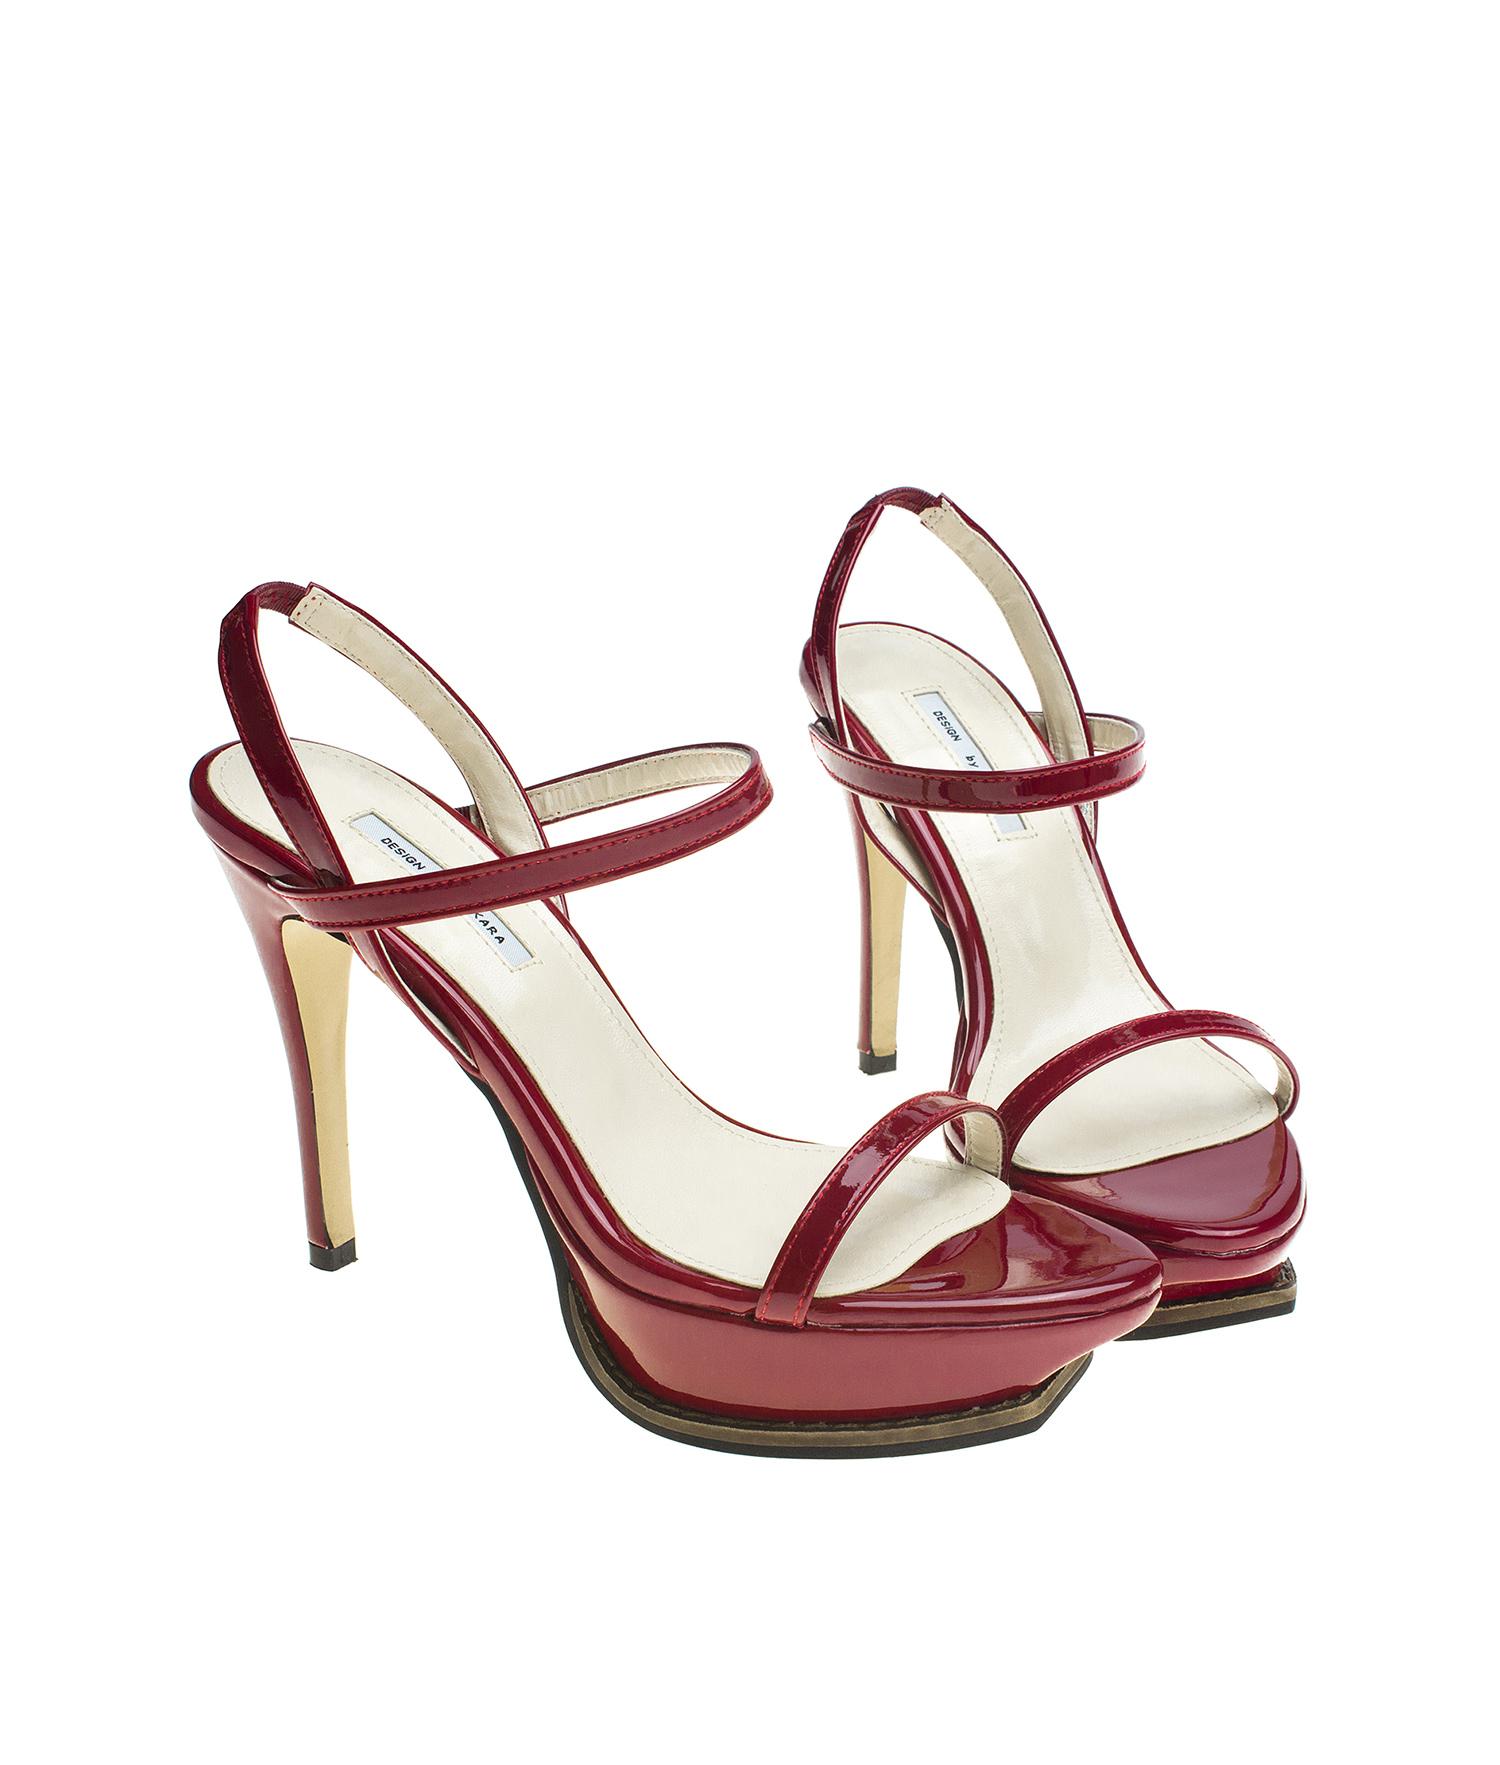 Patent Stiletto Heel Sandals Dress Shoes Annakastleshoes Com